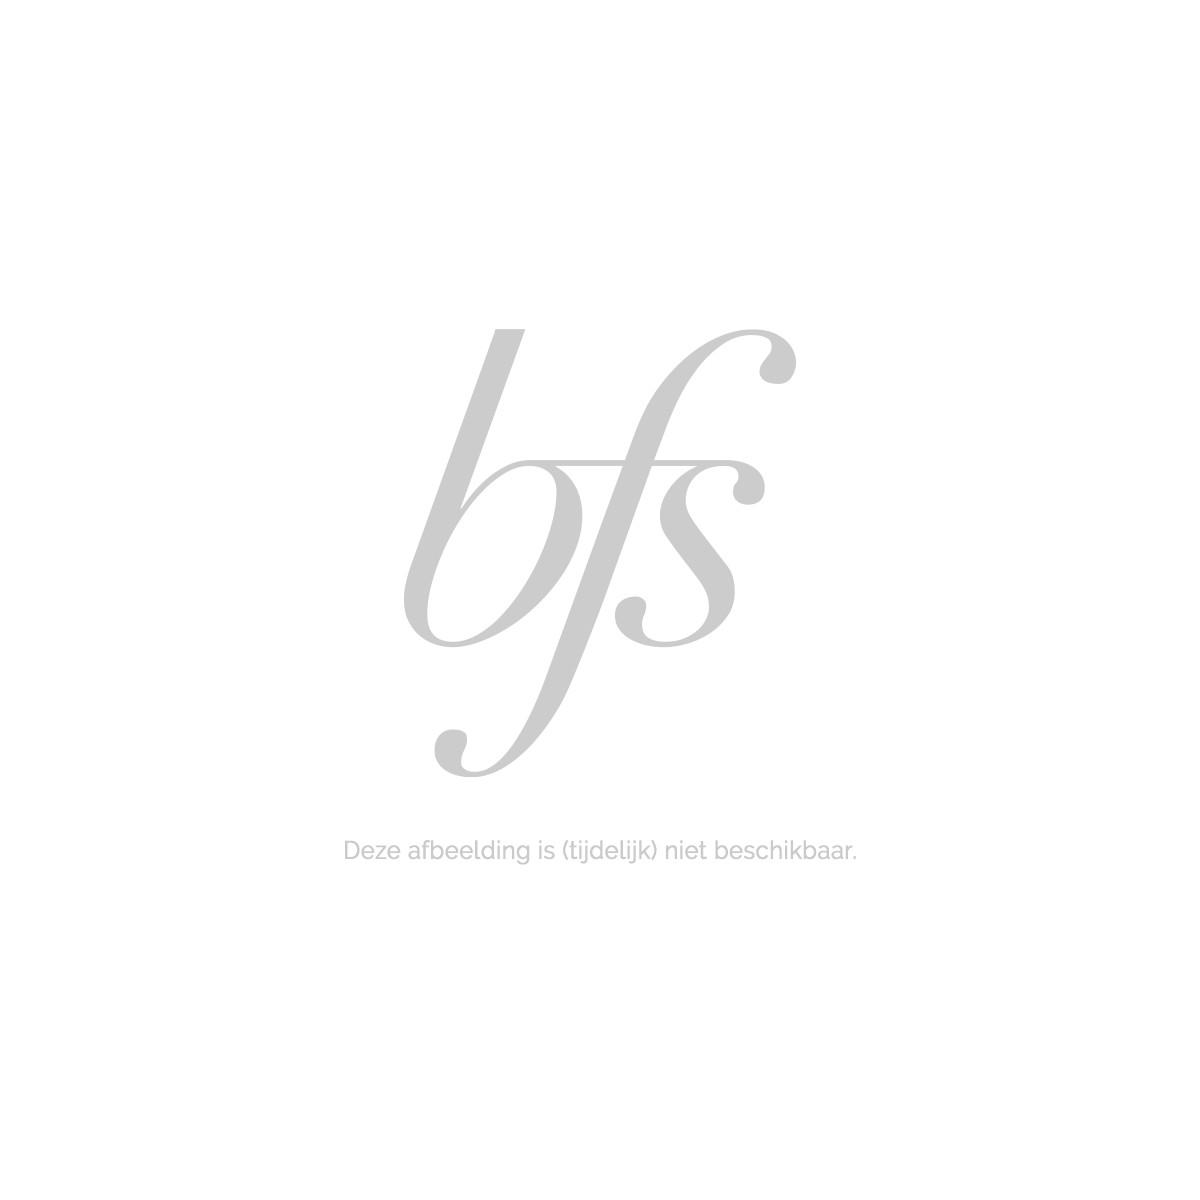 Fudge Clean Blonde Damaged Rewind Violet-Toning Shampoo 250Ml